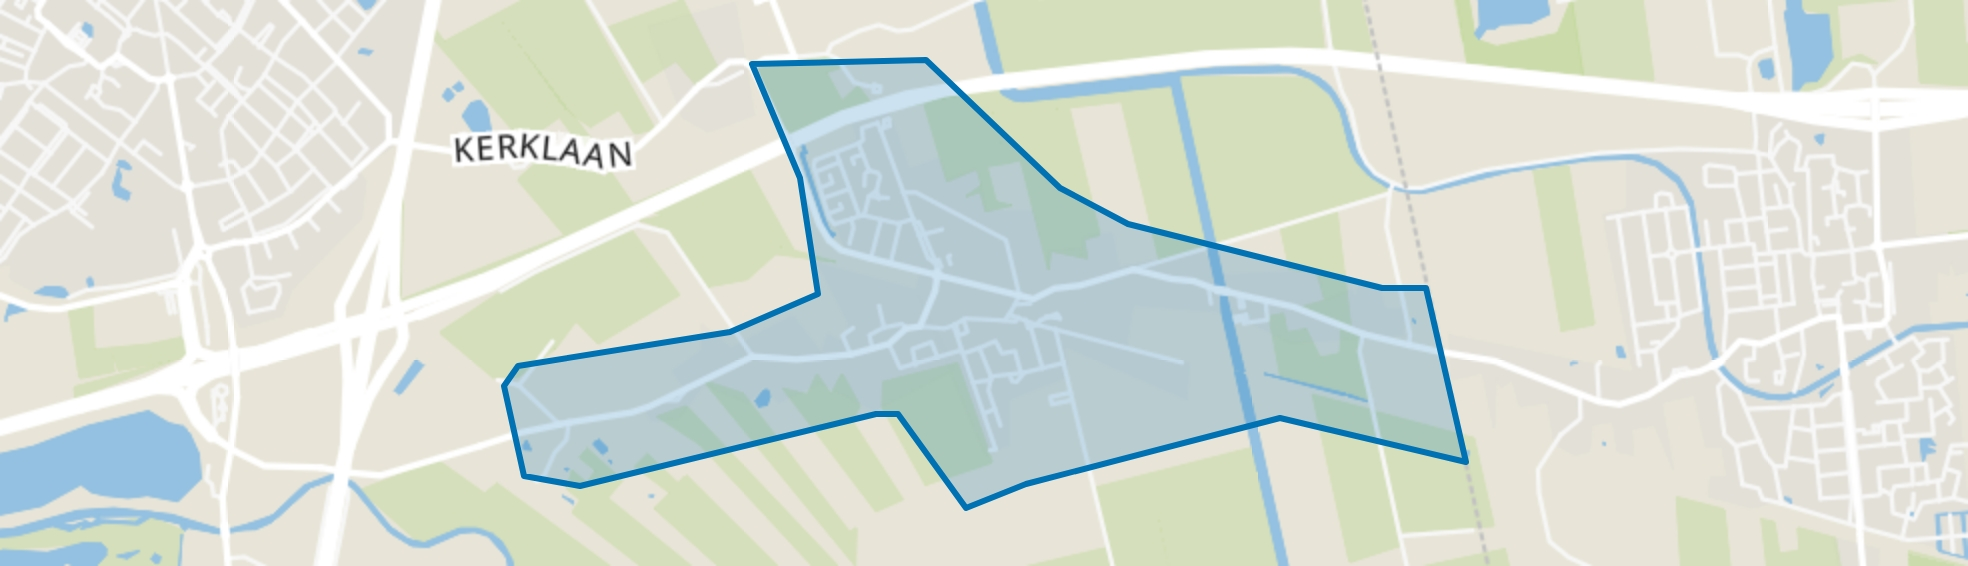 Raamsdonk, Raamsdonk map